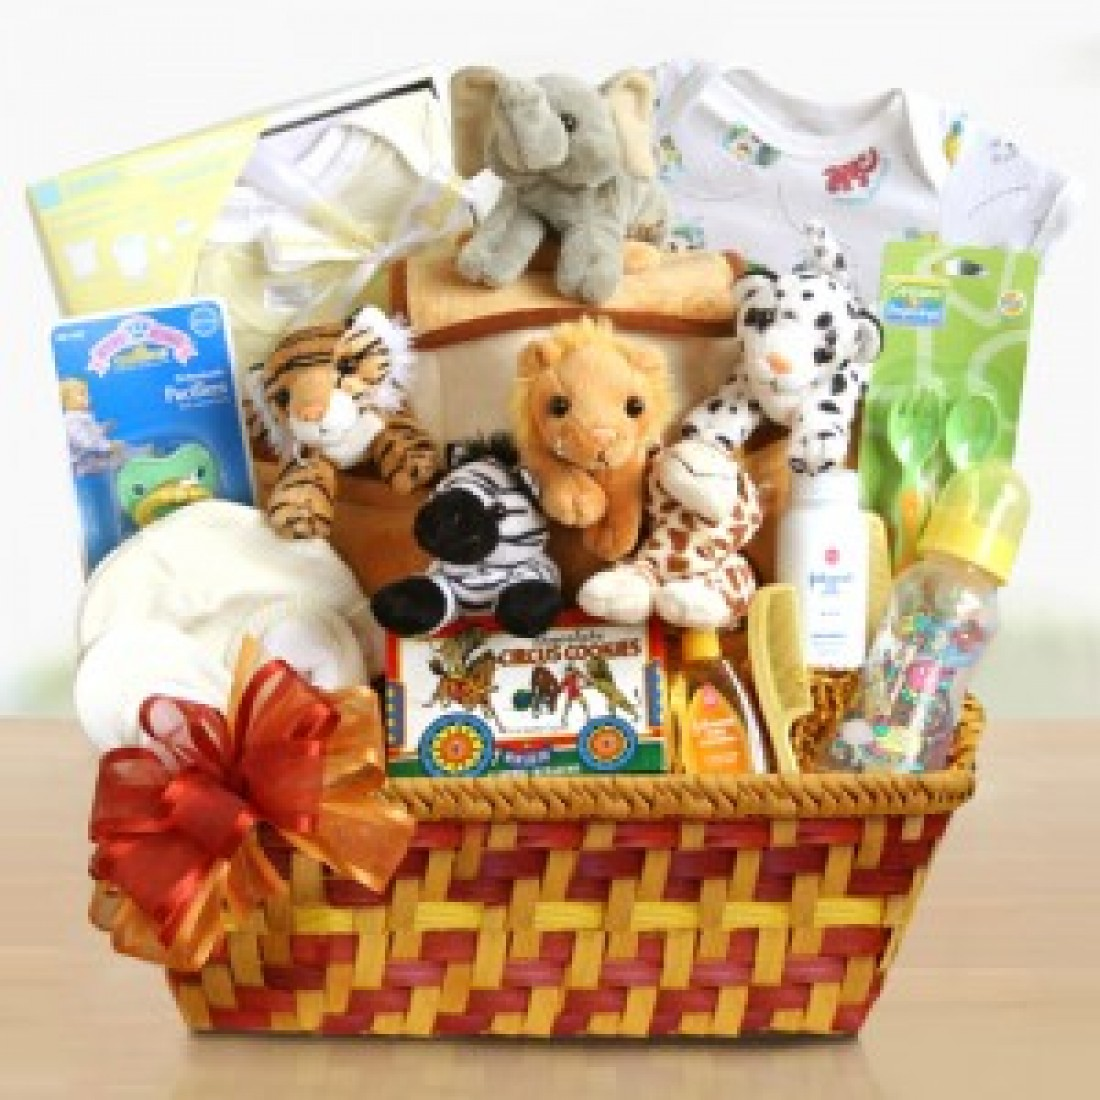 New Baby Boy Gift Baskets Free Shipping : Noah s ark baby gift basket free shipping